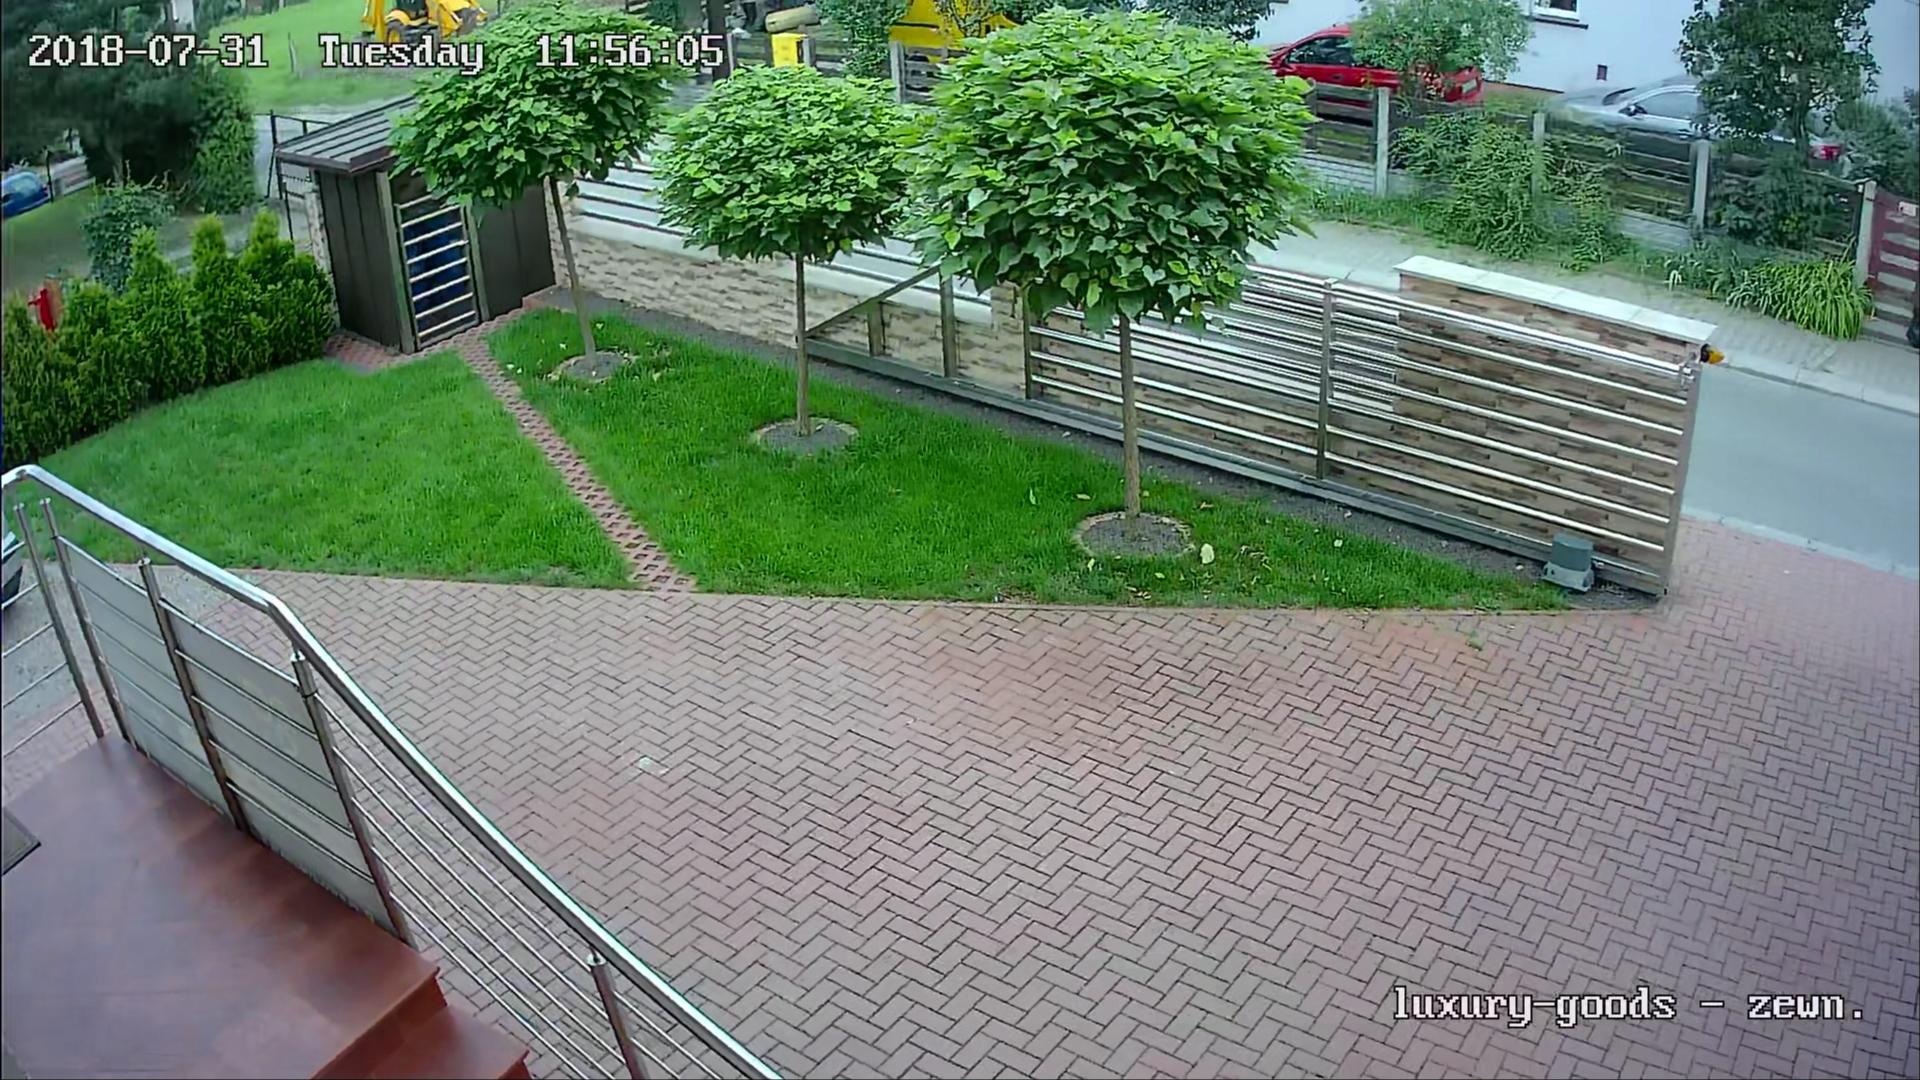 2x FULL HD SONY MONITORING H265+ NVR POE WDR IR Klasa szczelności kamery brak